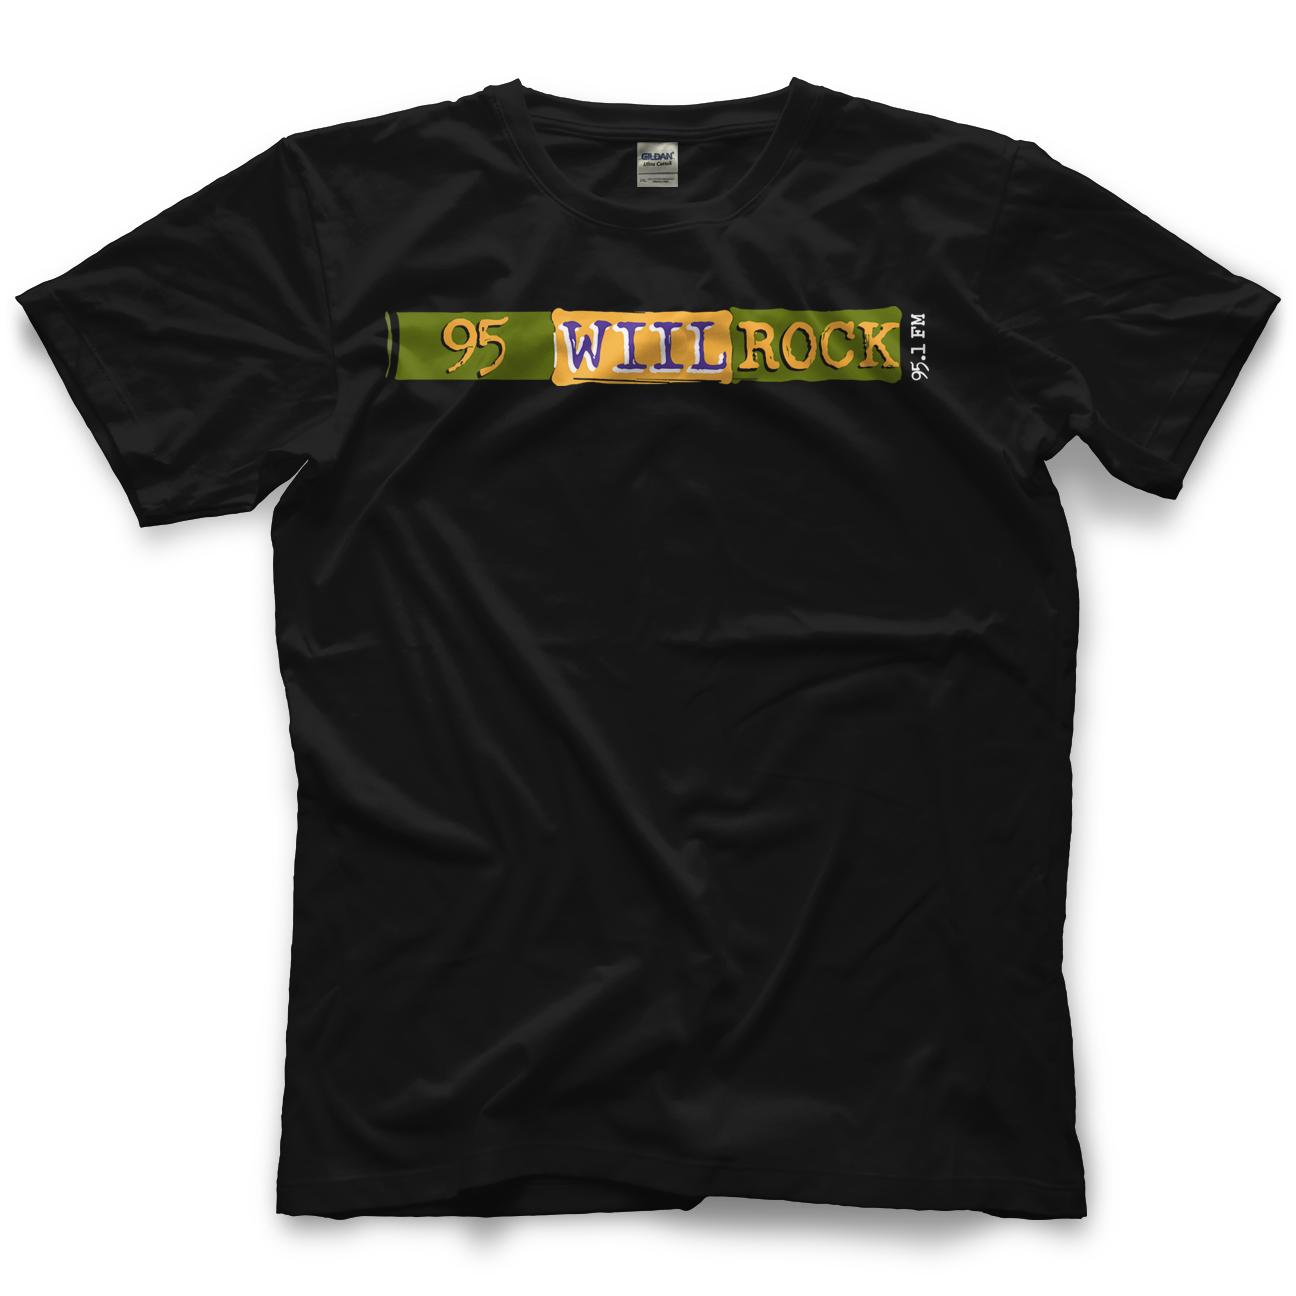 95 Will Rock 95 Will Rock T-shirt